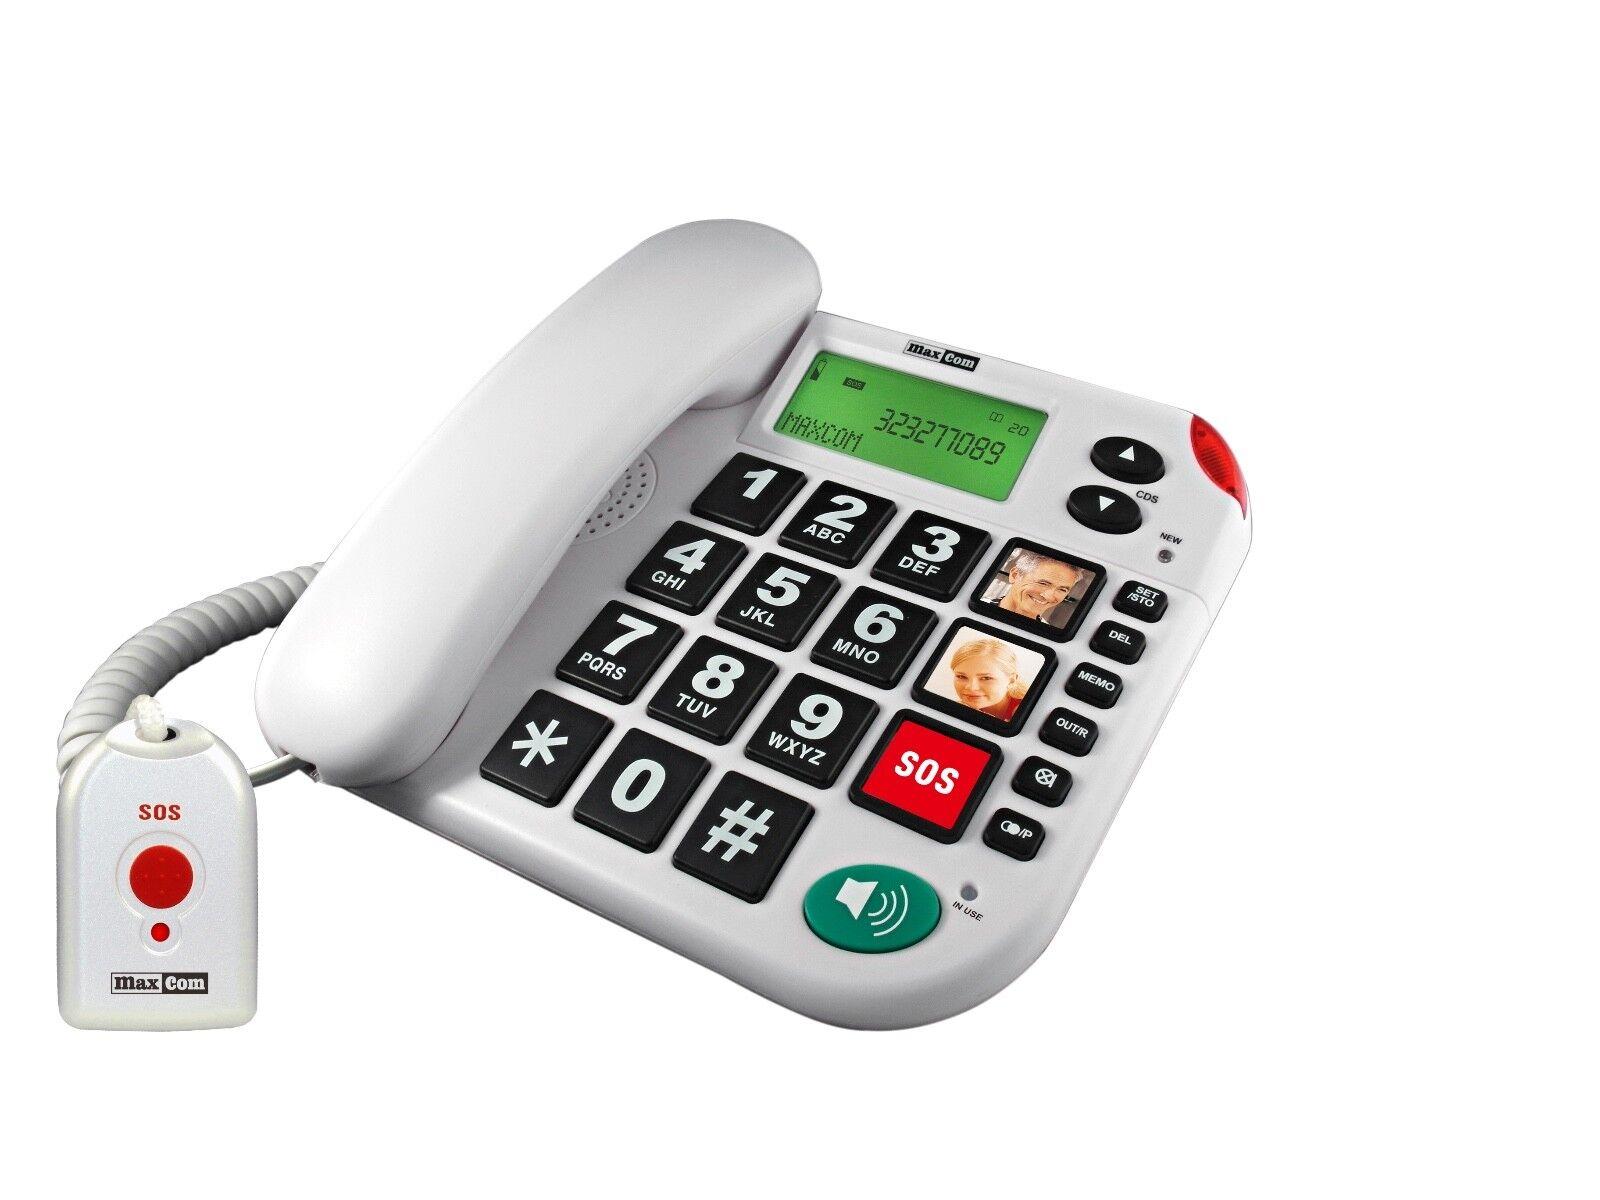 Senioren-Notruf-Telefon mit Notrufknopf Großtastentelefon Seniorentelefon Notruf